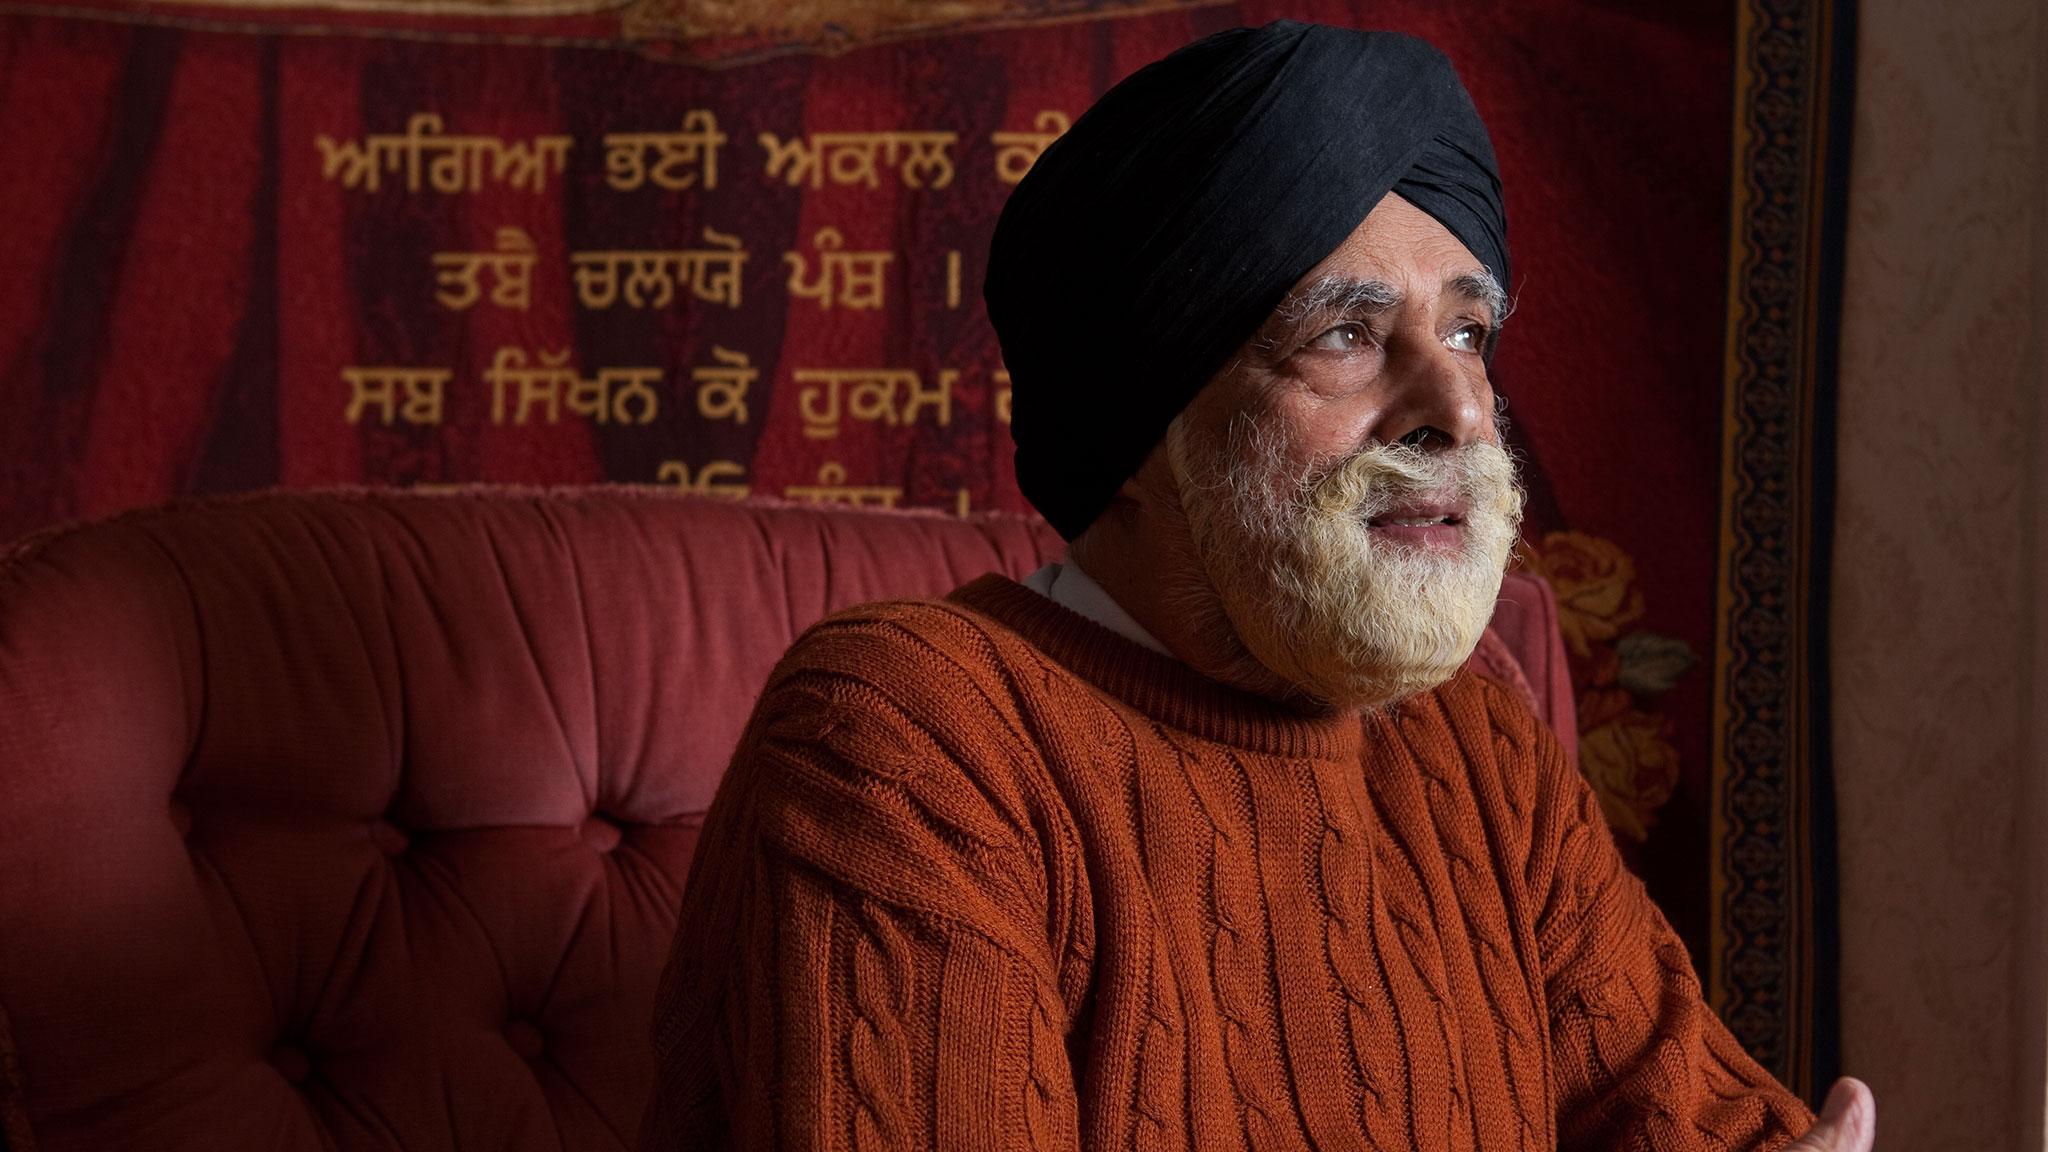 Indarjit Singh Sikh peer Indarjit Singh calls for closure on Golden Temple attack